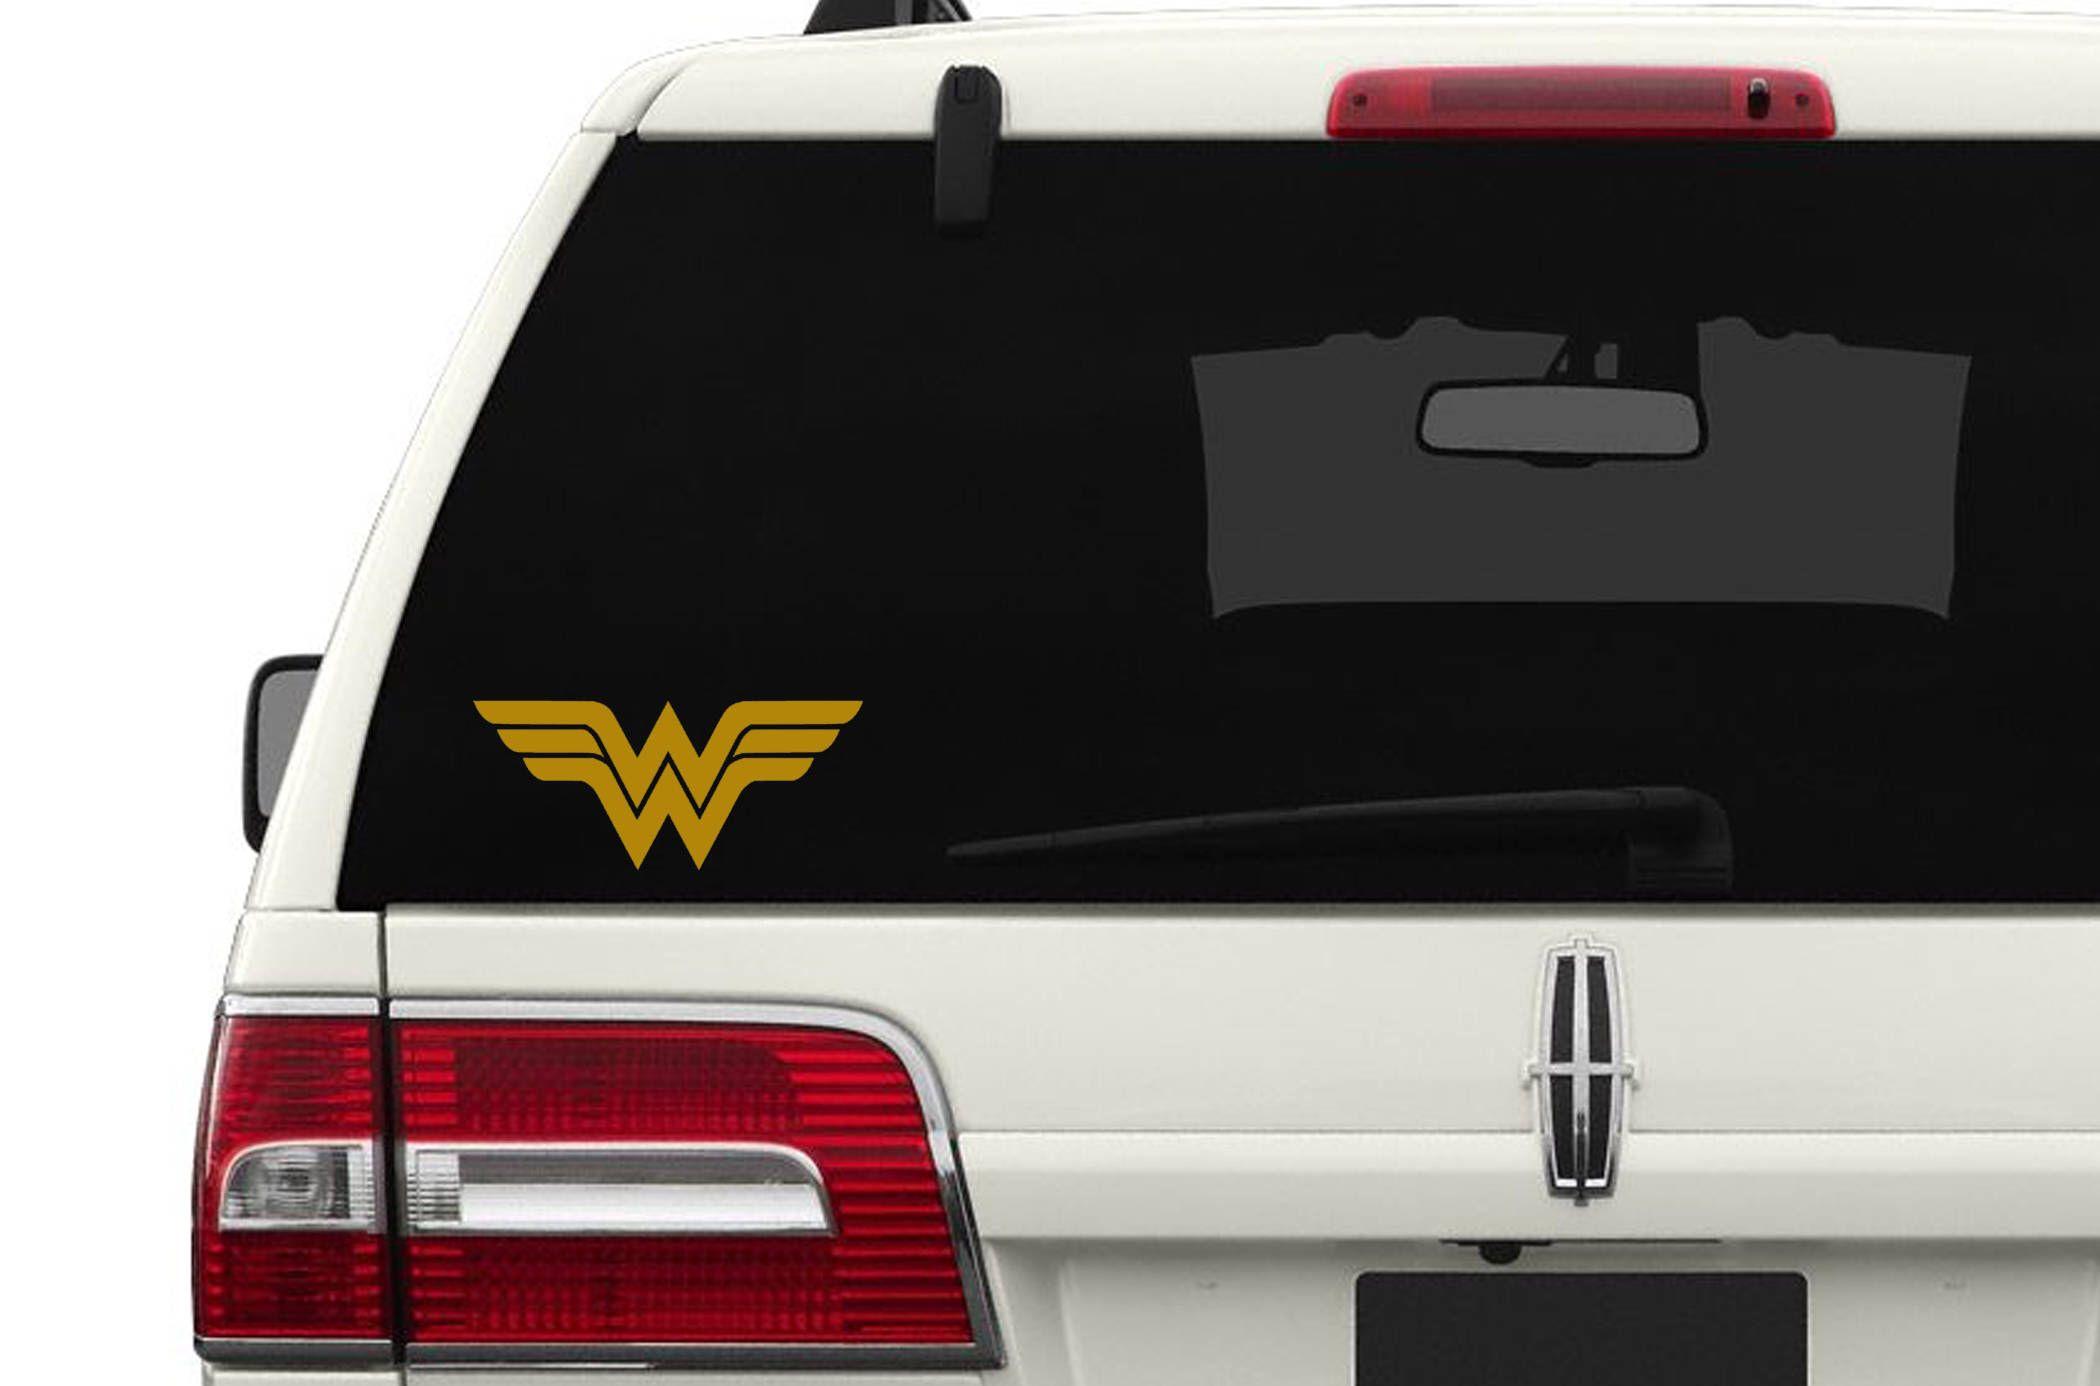 Wonder Woman Stars Emblem Dc Comics Inspired Justice League Fan Art Vinyl Car Laptop Decal Vinyl Cricut Vinyl Vinyl Decals [ 1501 x 1501 Pixel ]